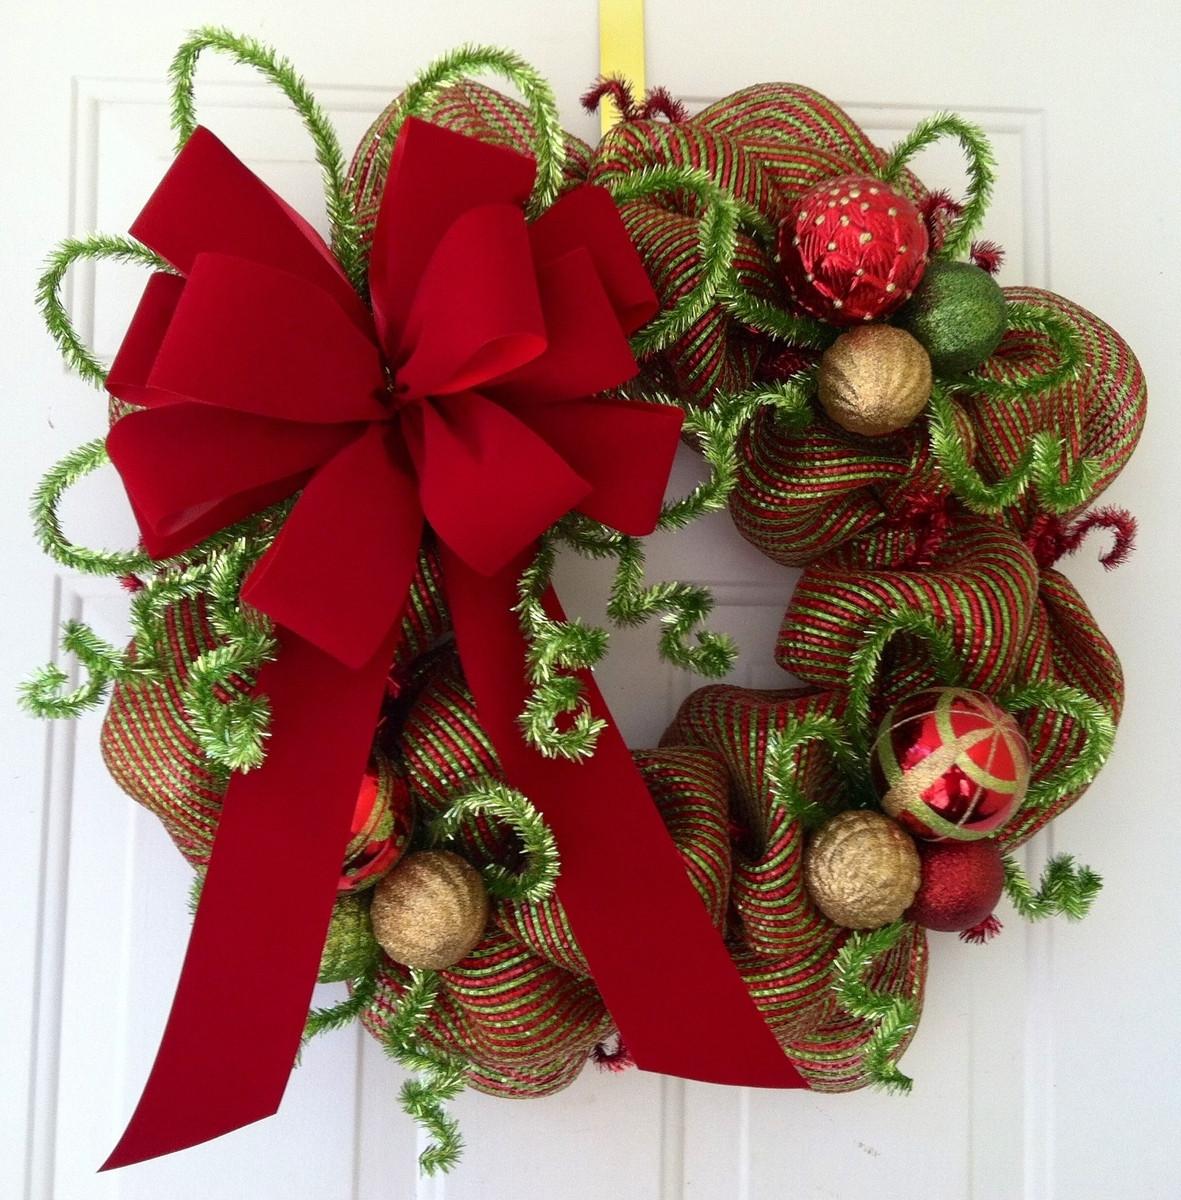 DIY Christmas Wreath Ideas  Make A Diy Christmas Wreaths Yourself To Celebrate The